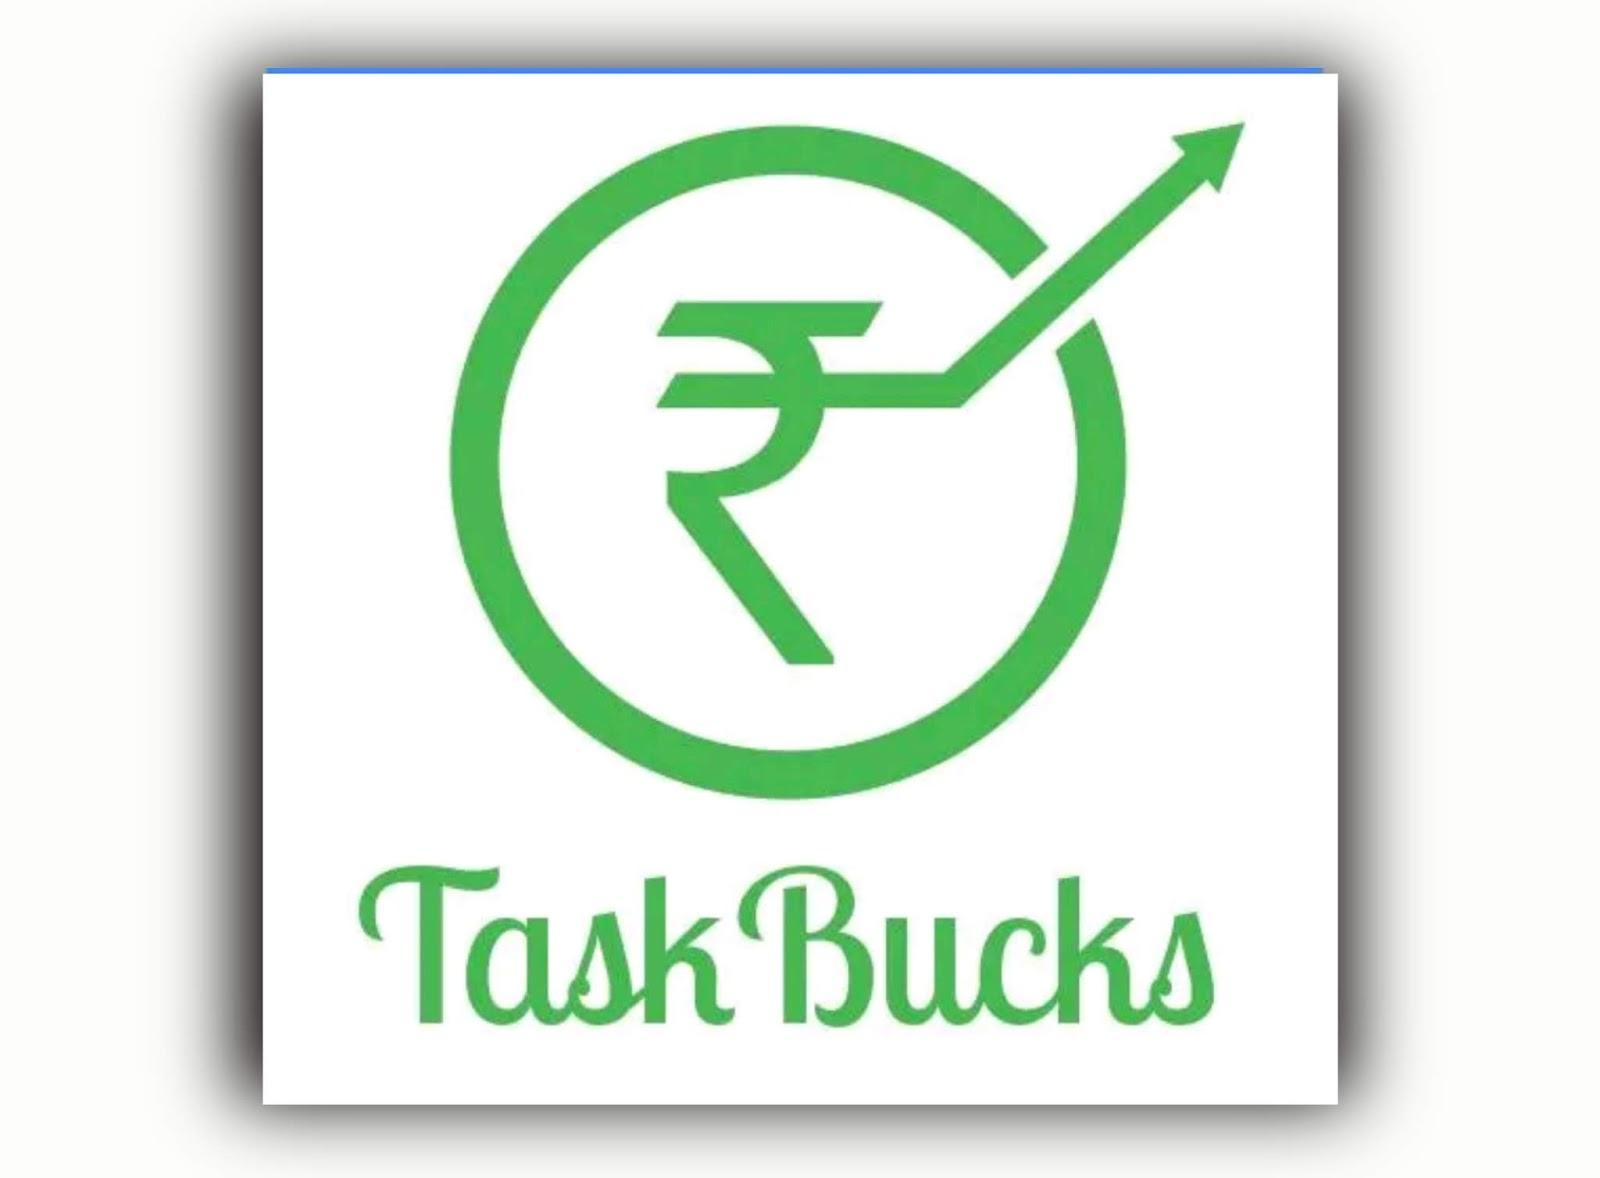 Taskbucks mod apk